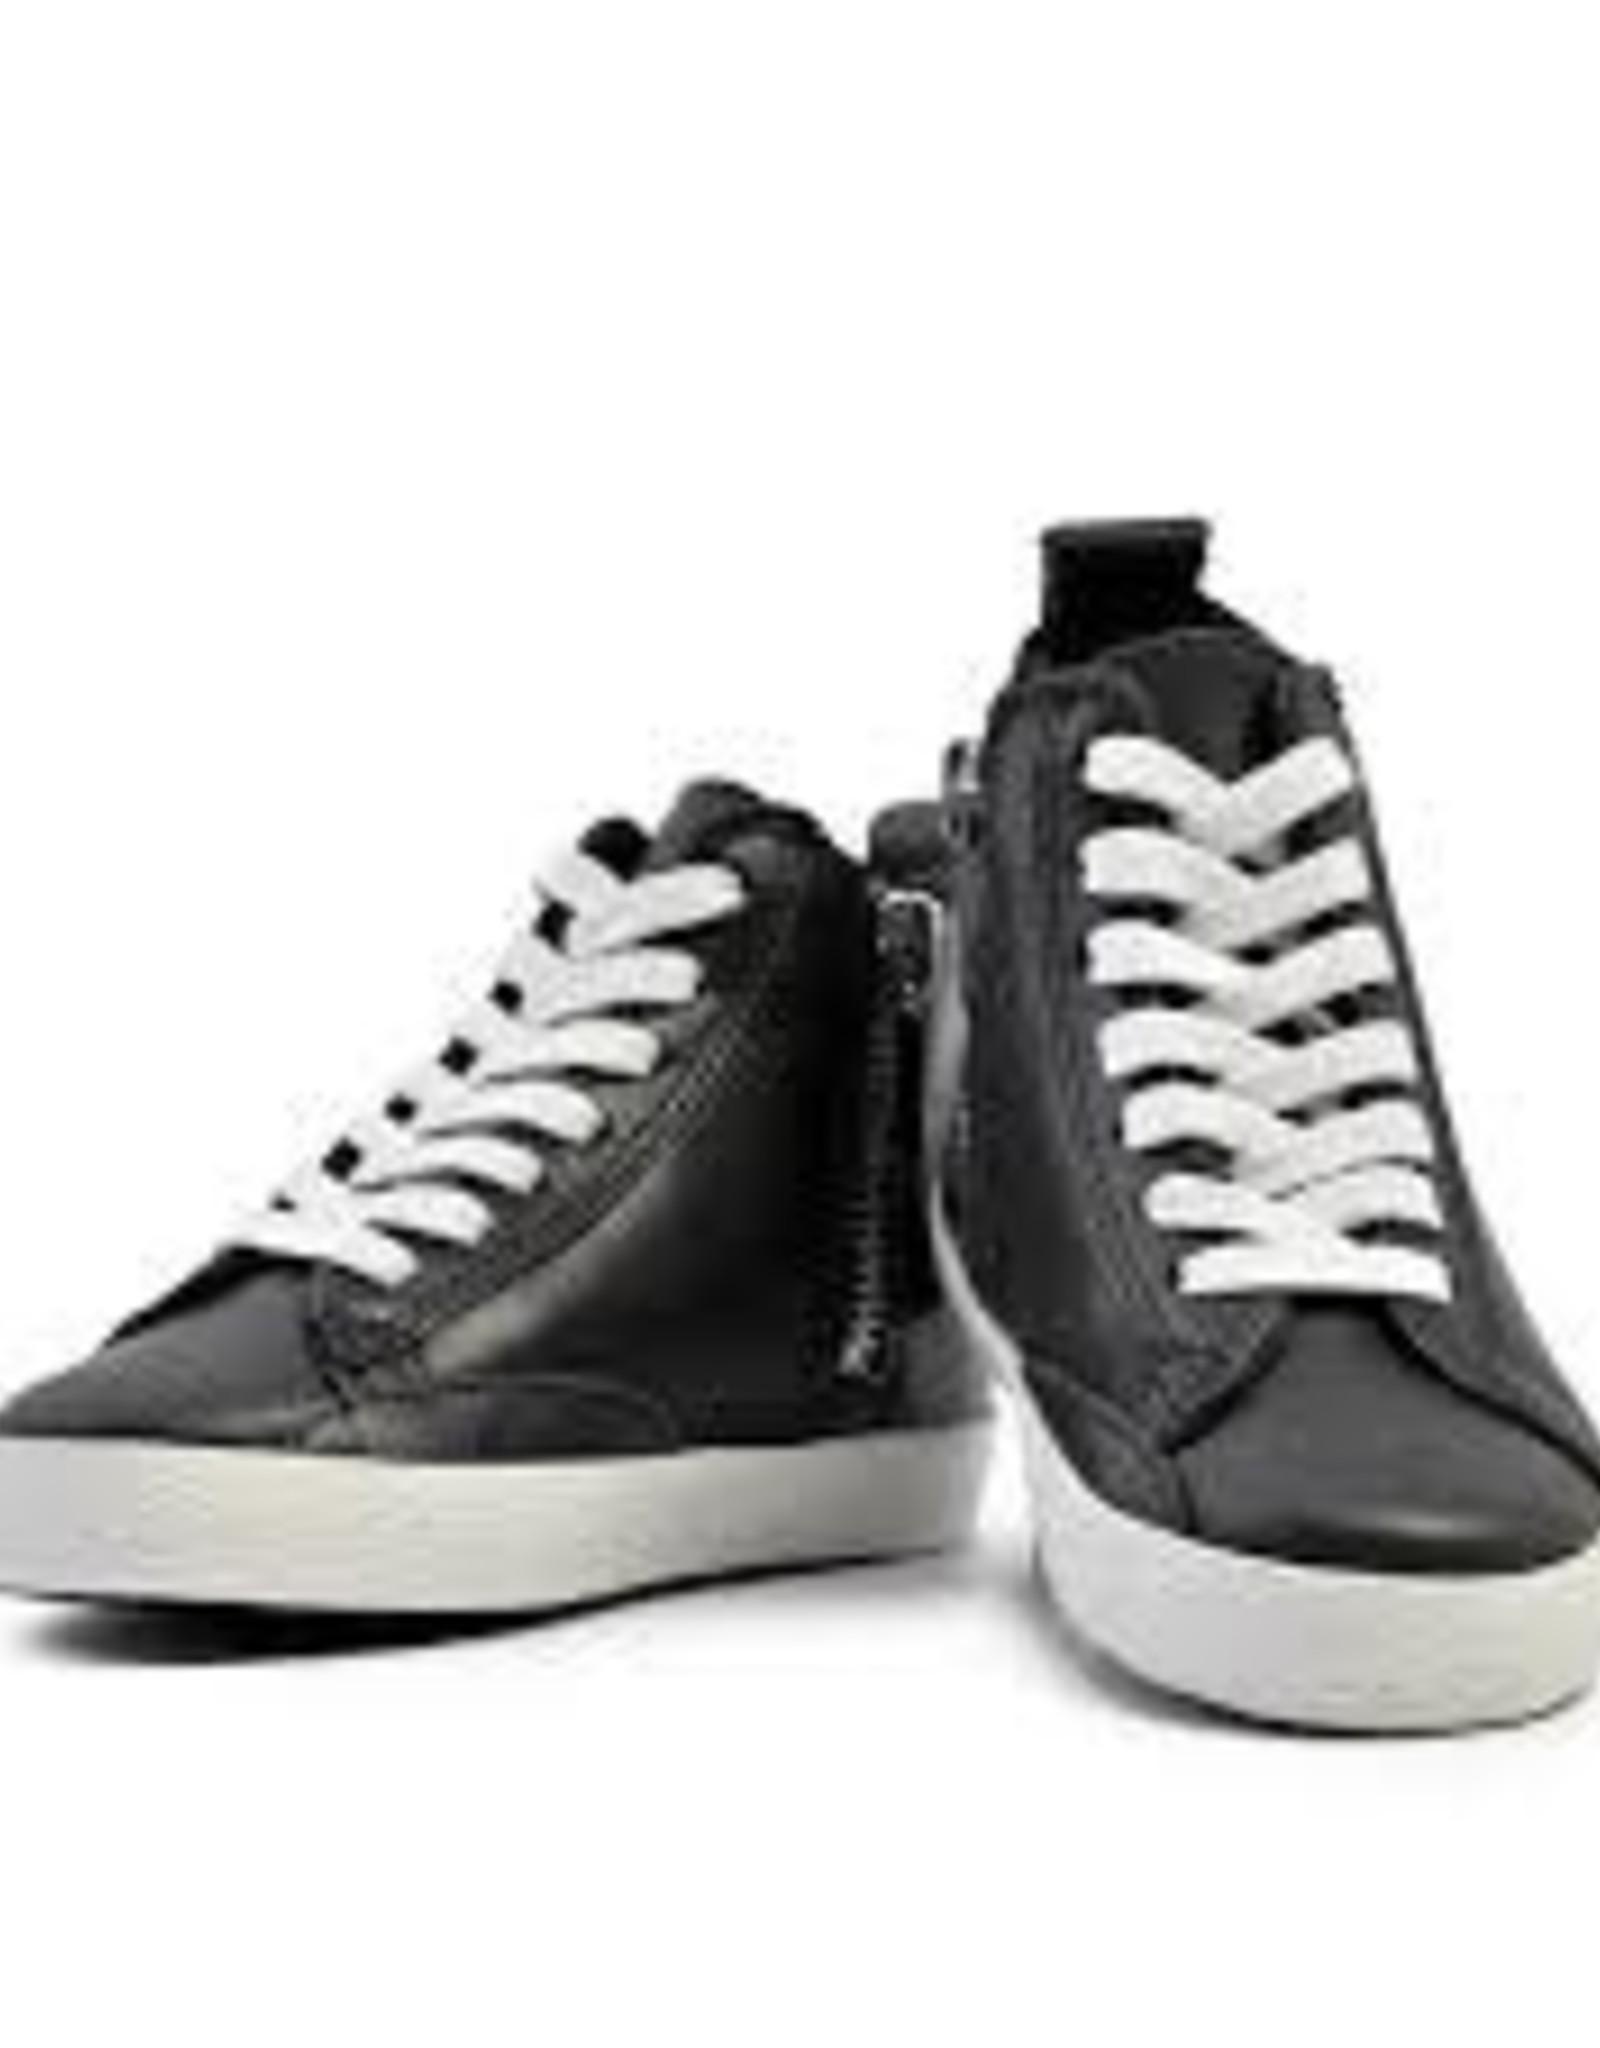 Piper Finn Piper Finn BlackHi Top Sneakers